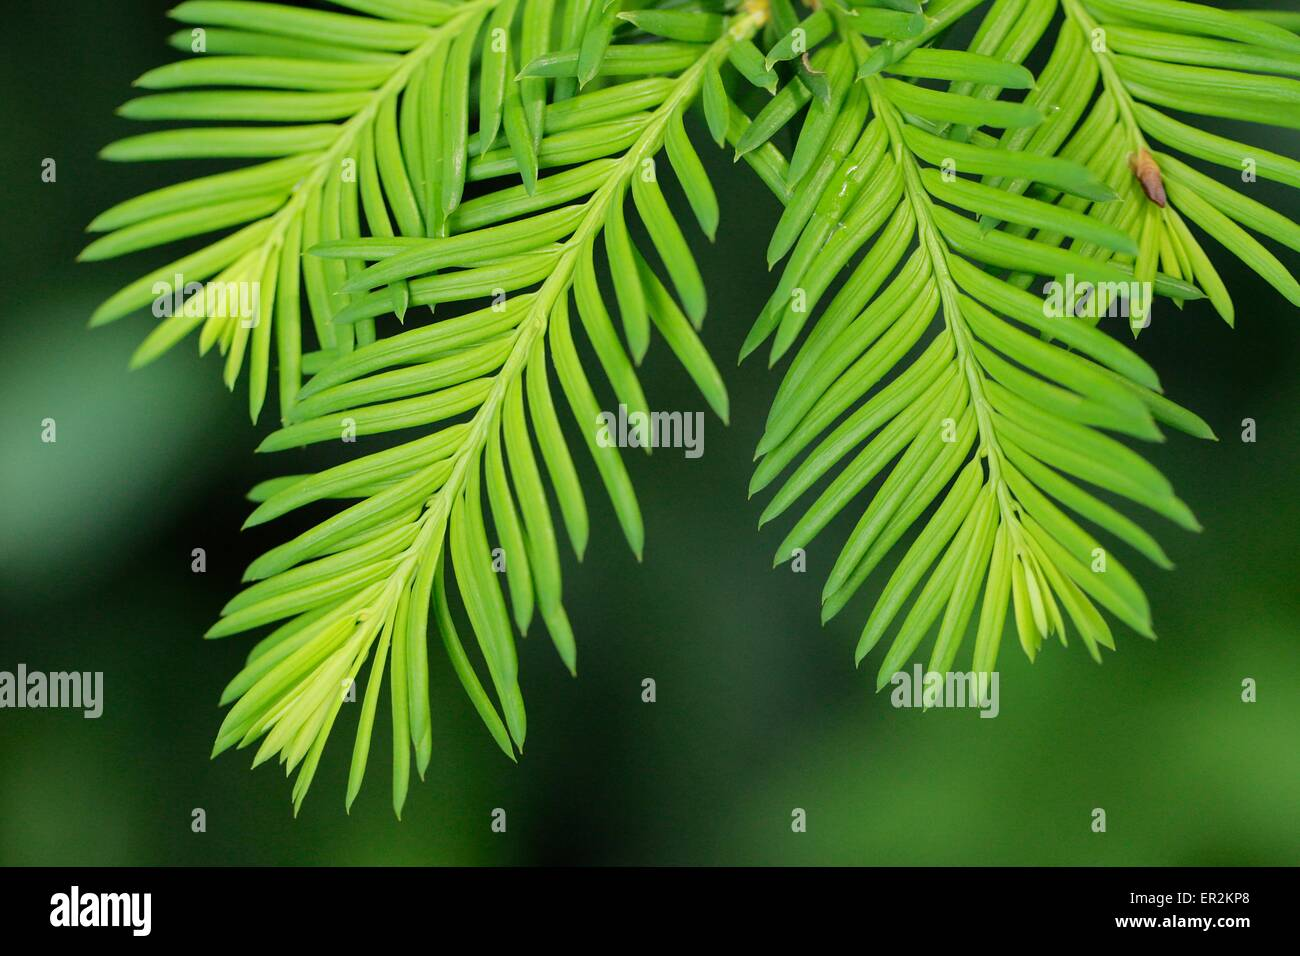 Yew foliiage. Taxus baccata. - Stock Image